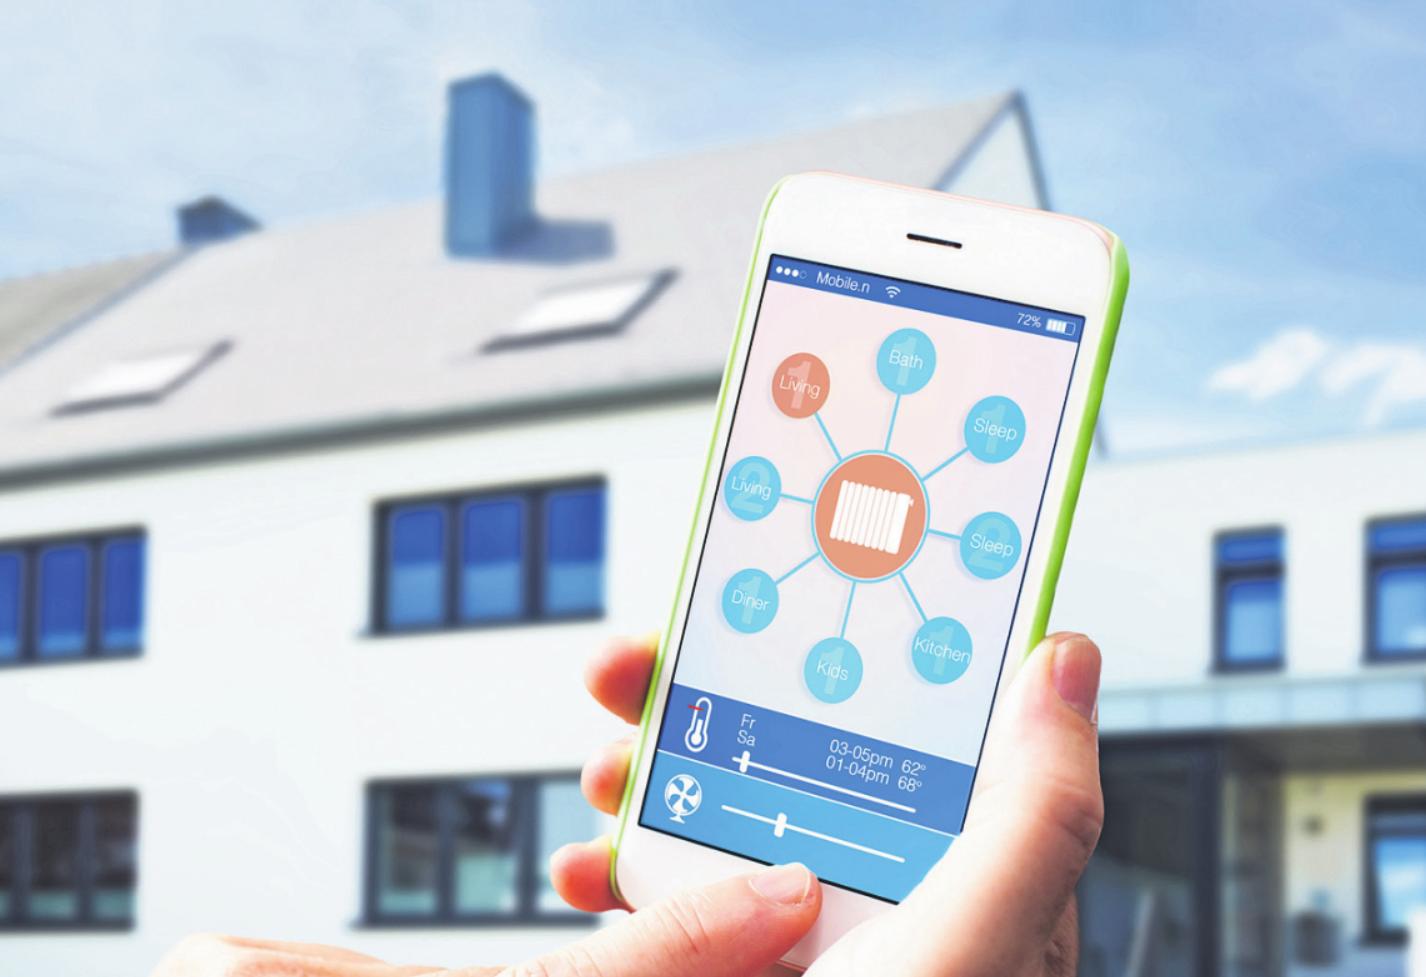 Per Smartphone lässt sich die Raumtemperatur innerhalb des Hauses regulieren. Foto: AA+W – stock.adobe.com